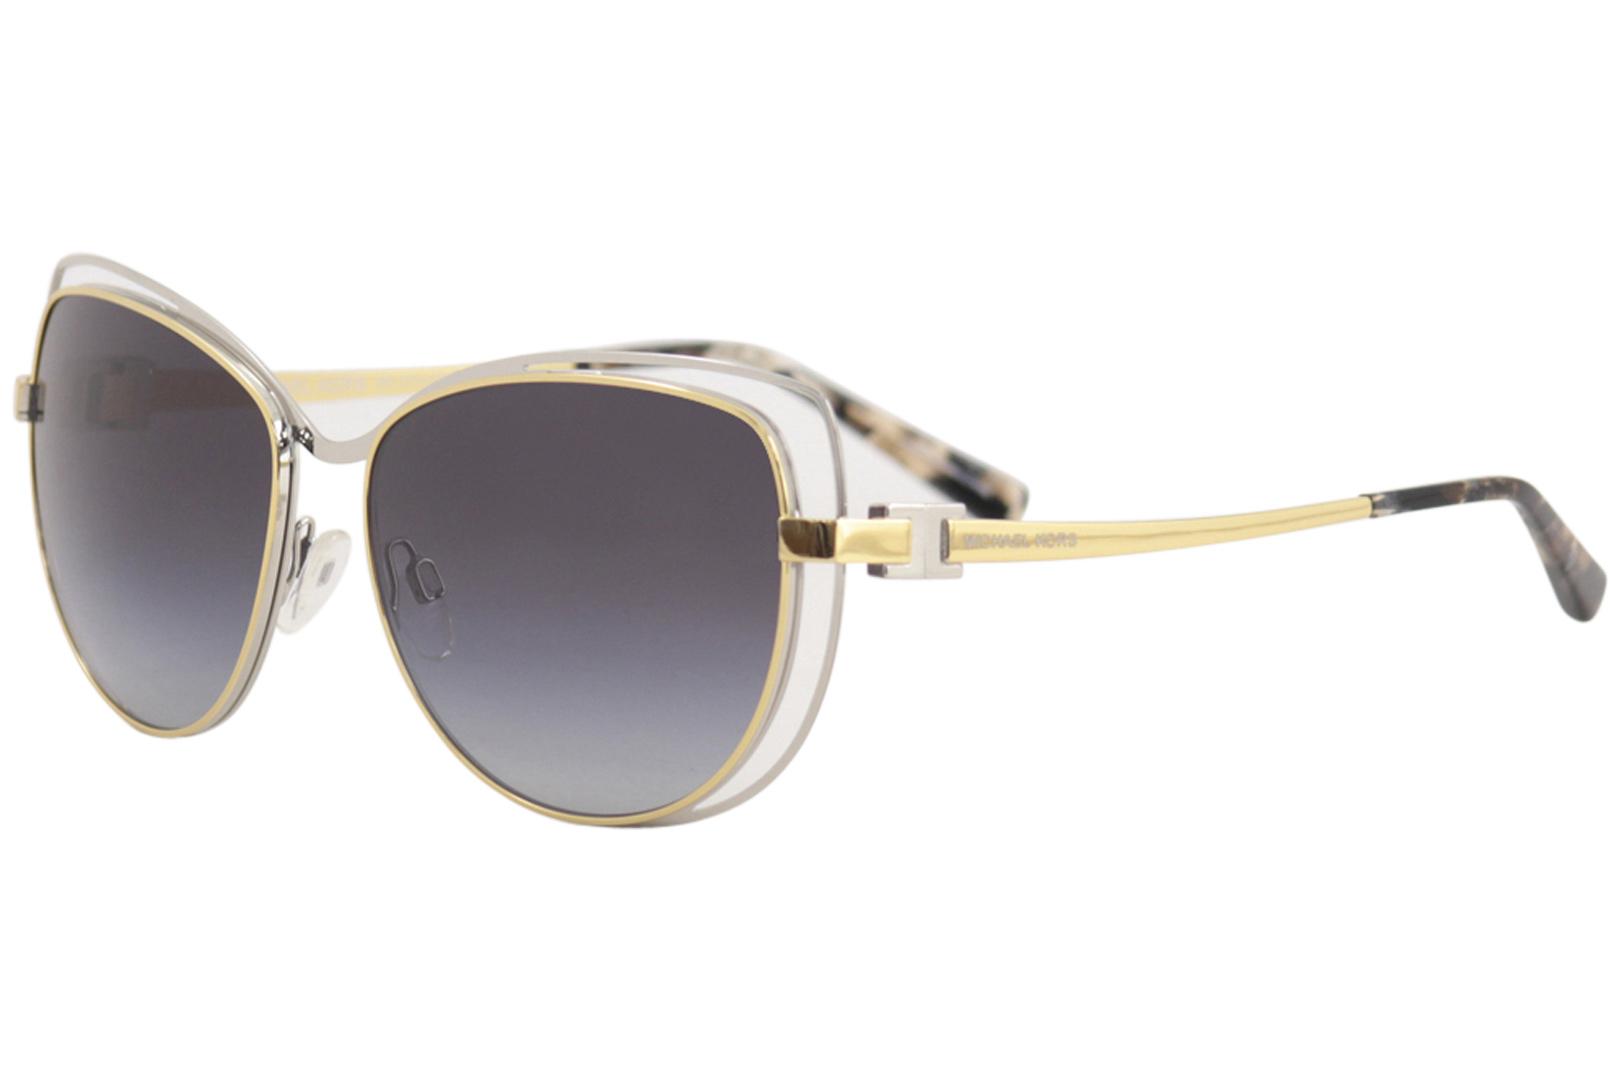 07a414351a56c Michael Kors Audrina MK1013 MK 1013 112011 Silver Gold Cat Eye ...